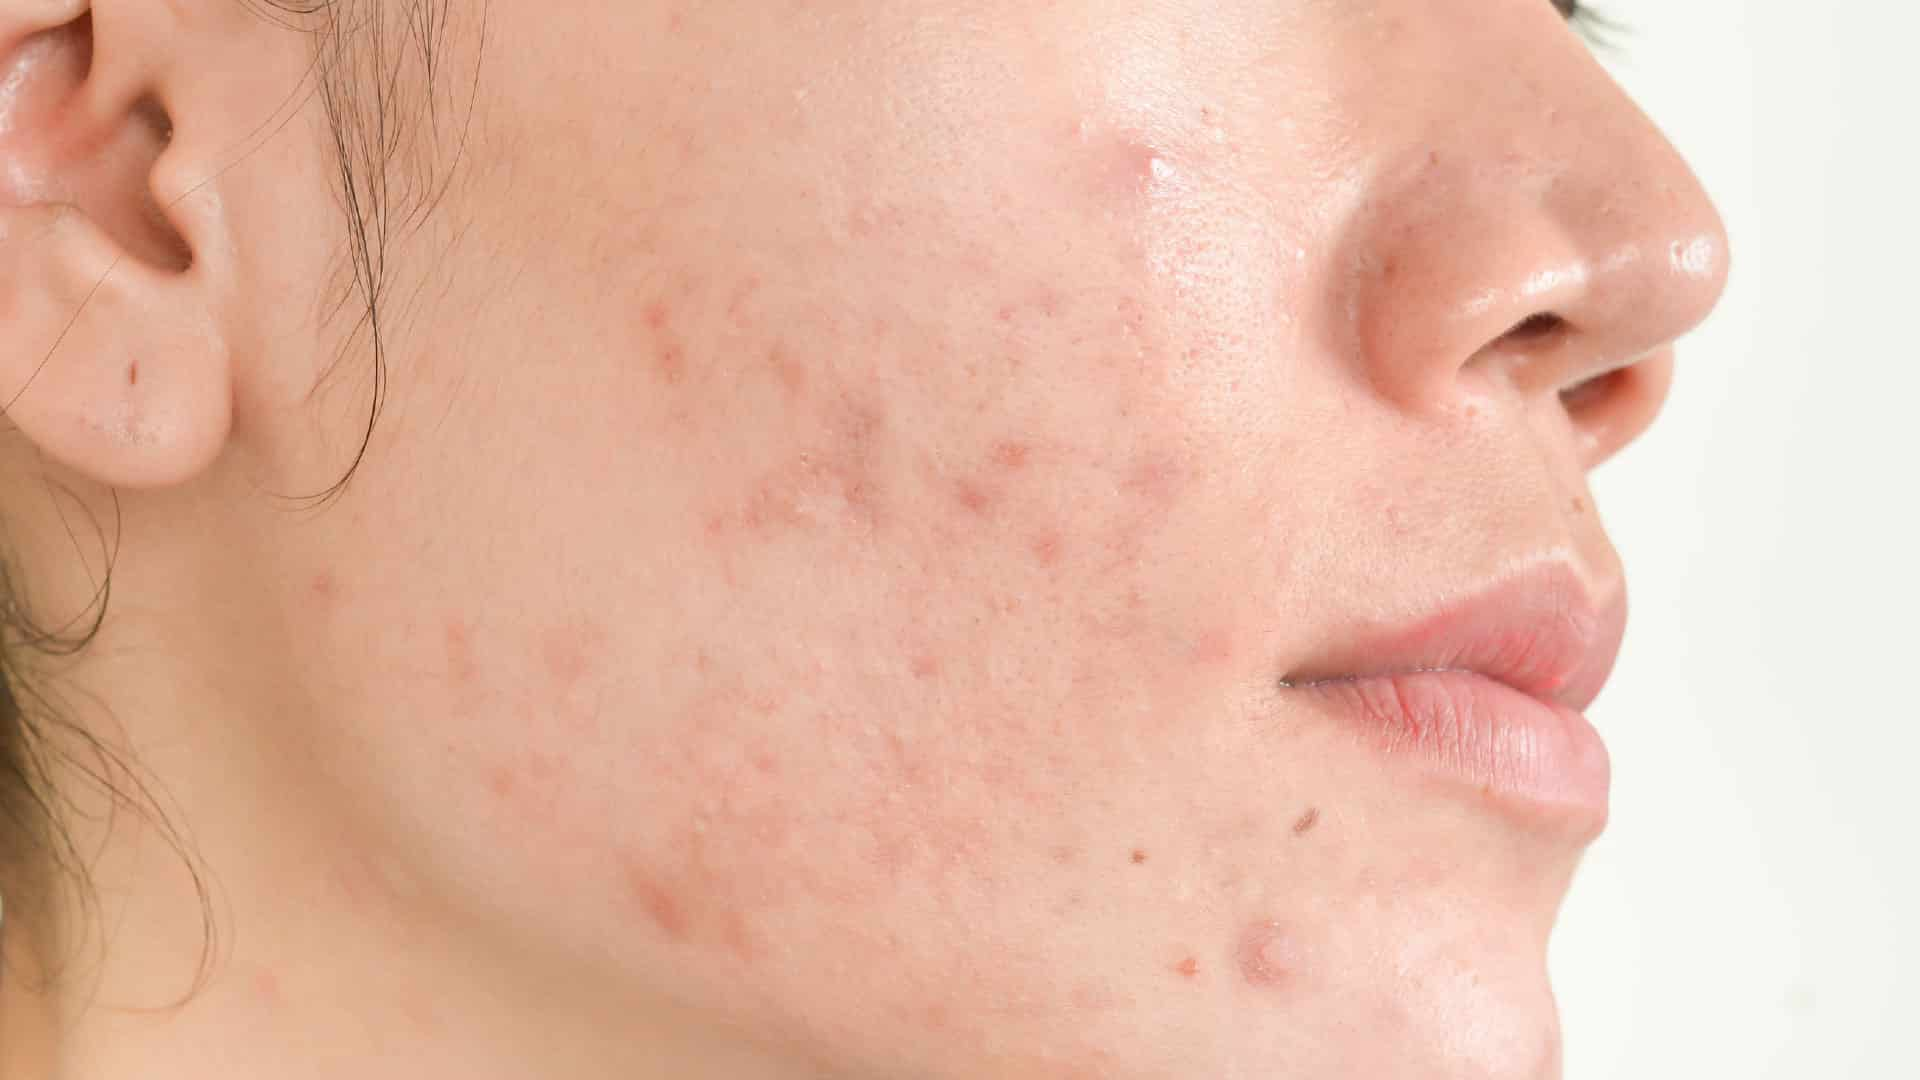 acupuntura estética para acne